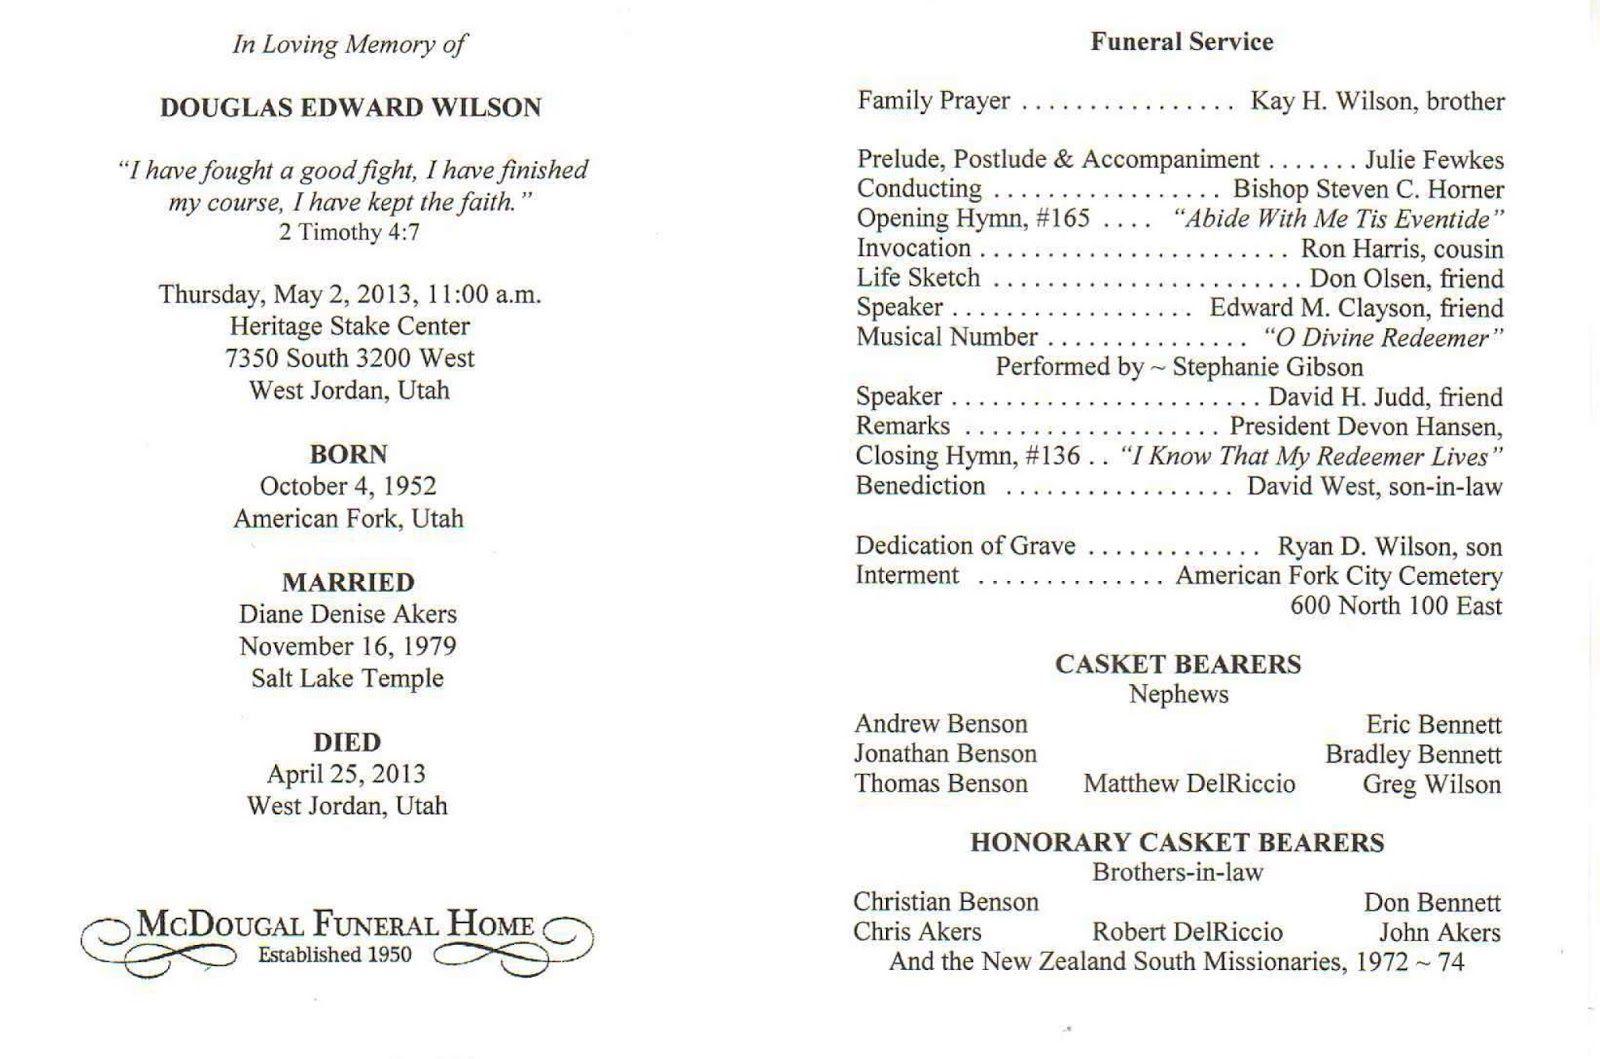 002 Beautiful Catholic Funeral Program Template High Def  Mas Layout FreeFull